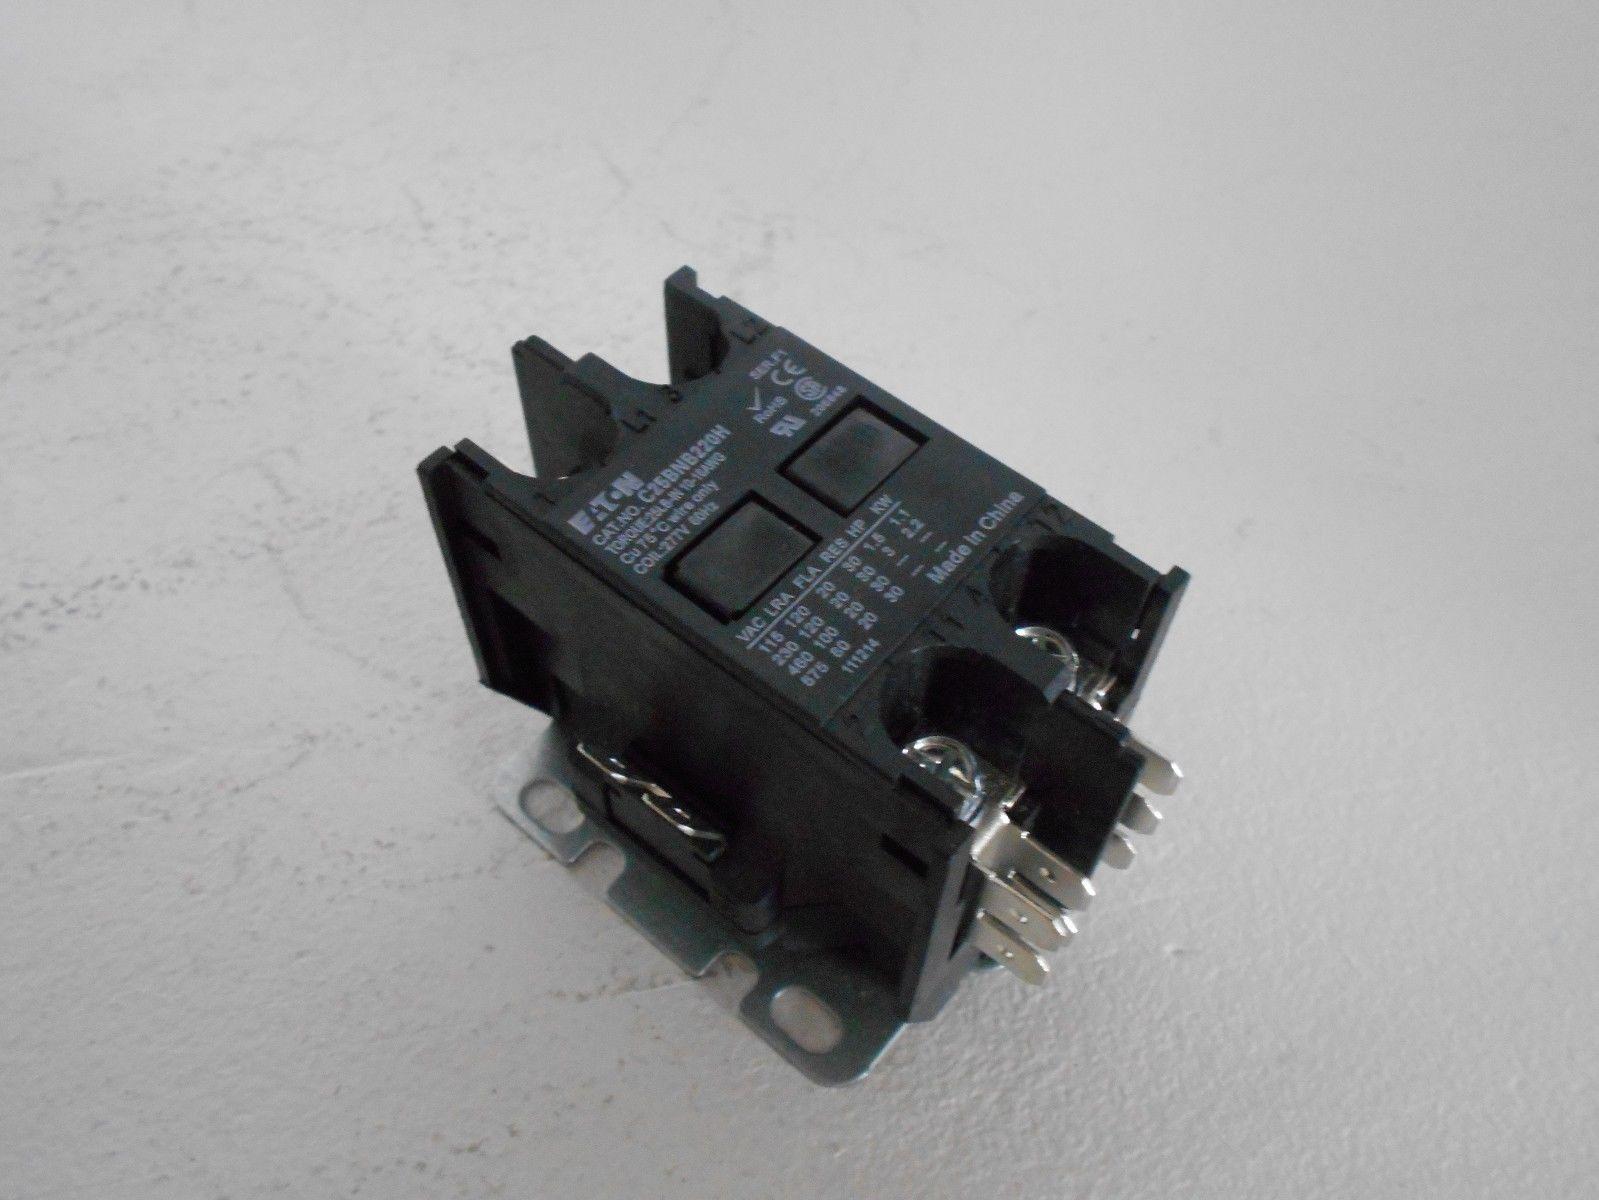 Eaton C25dnd230a Wiring Diagram Contactor Best Secret 3 Phase Starter Box Ac Motor